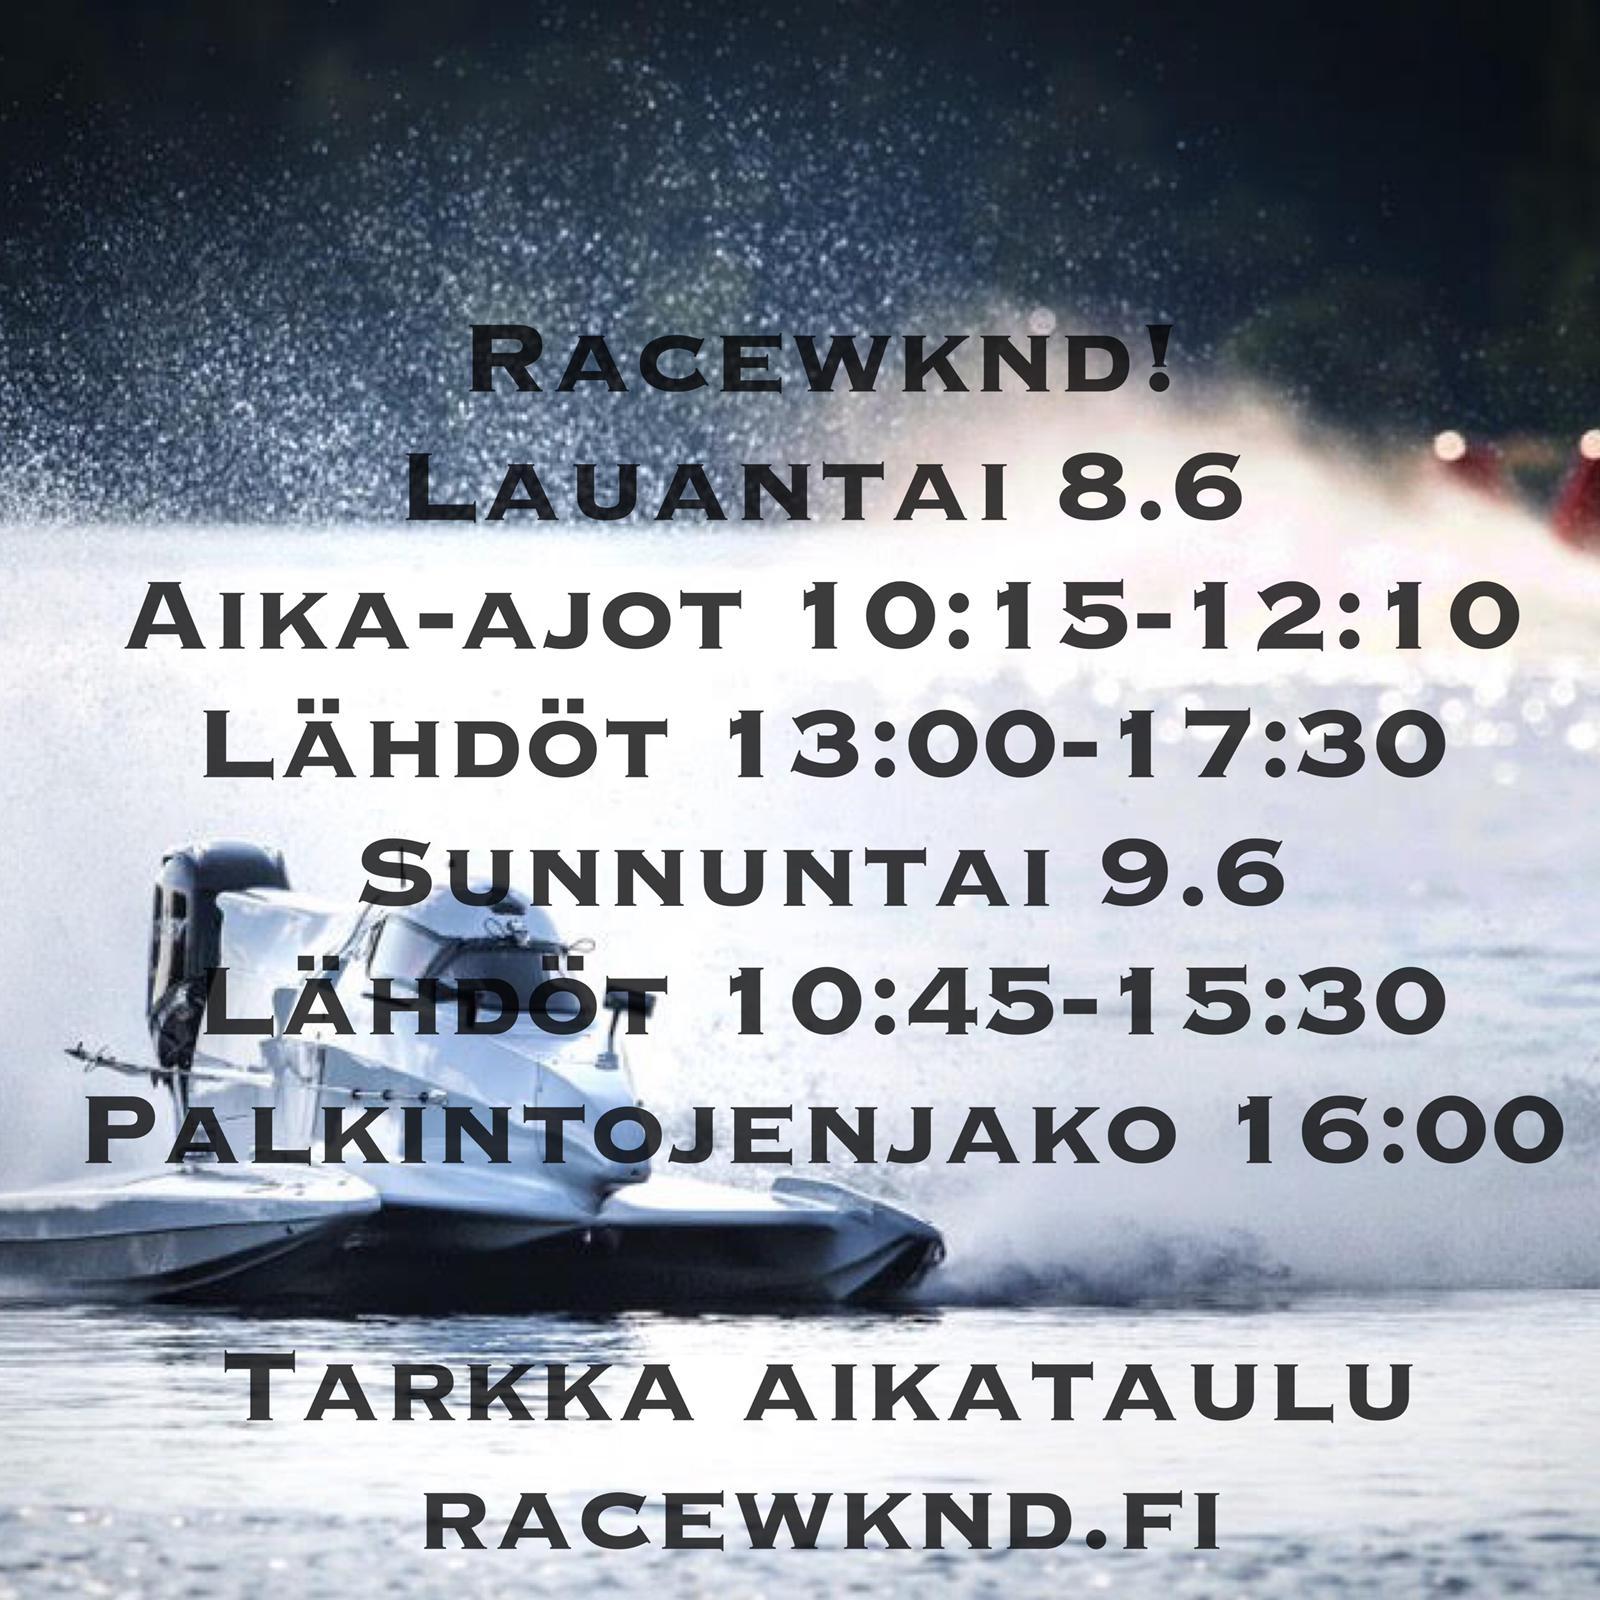 race wknd rauma